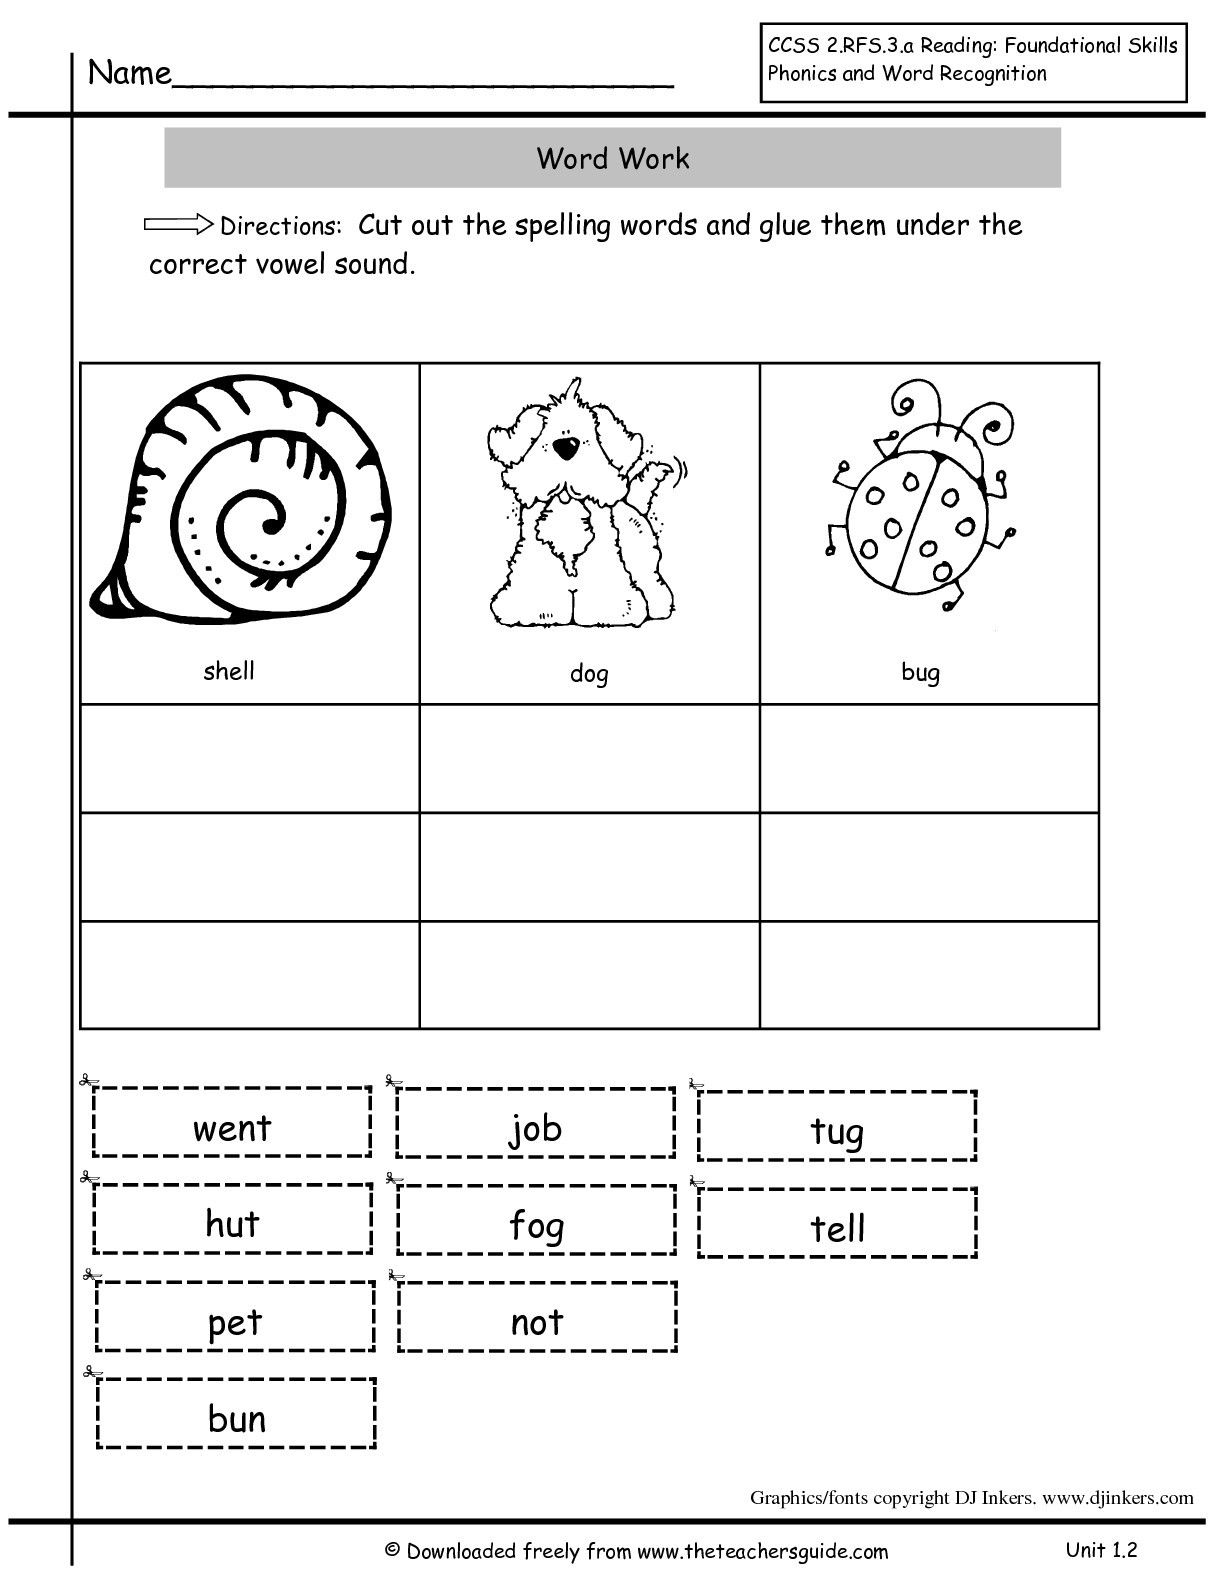 Inflectional Endings Worksheets 2nd Grade In